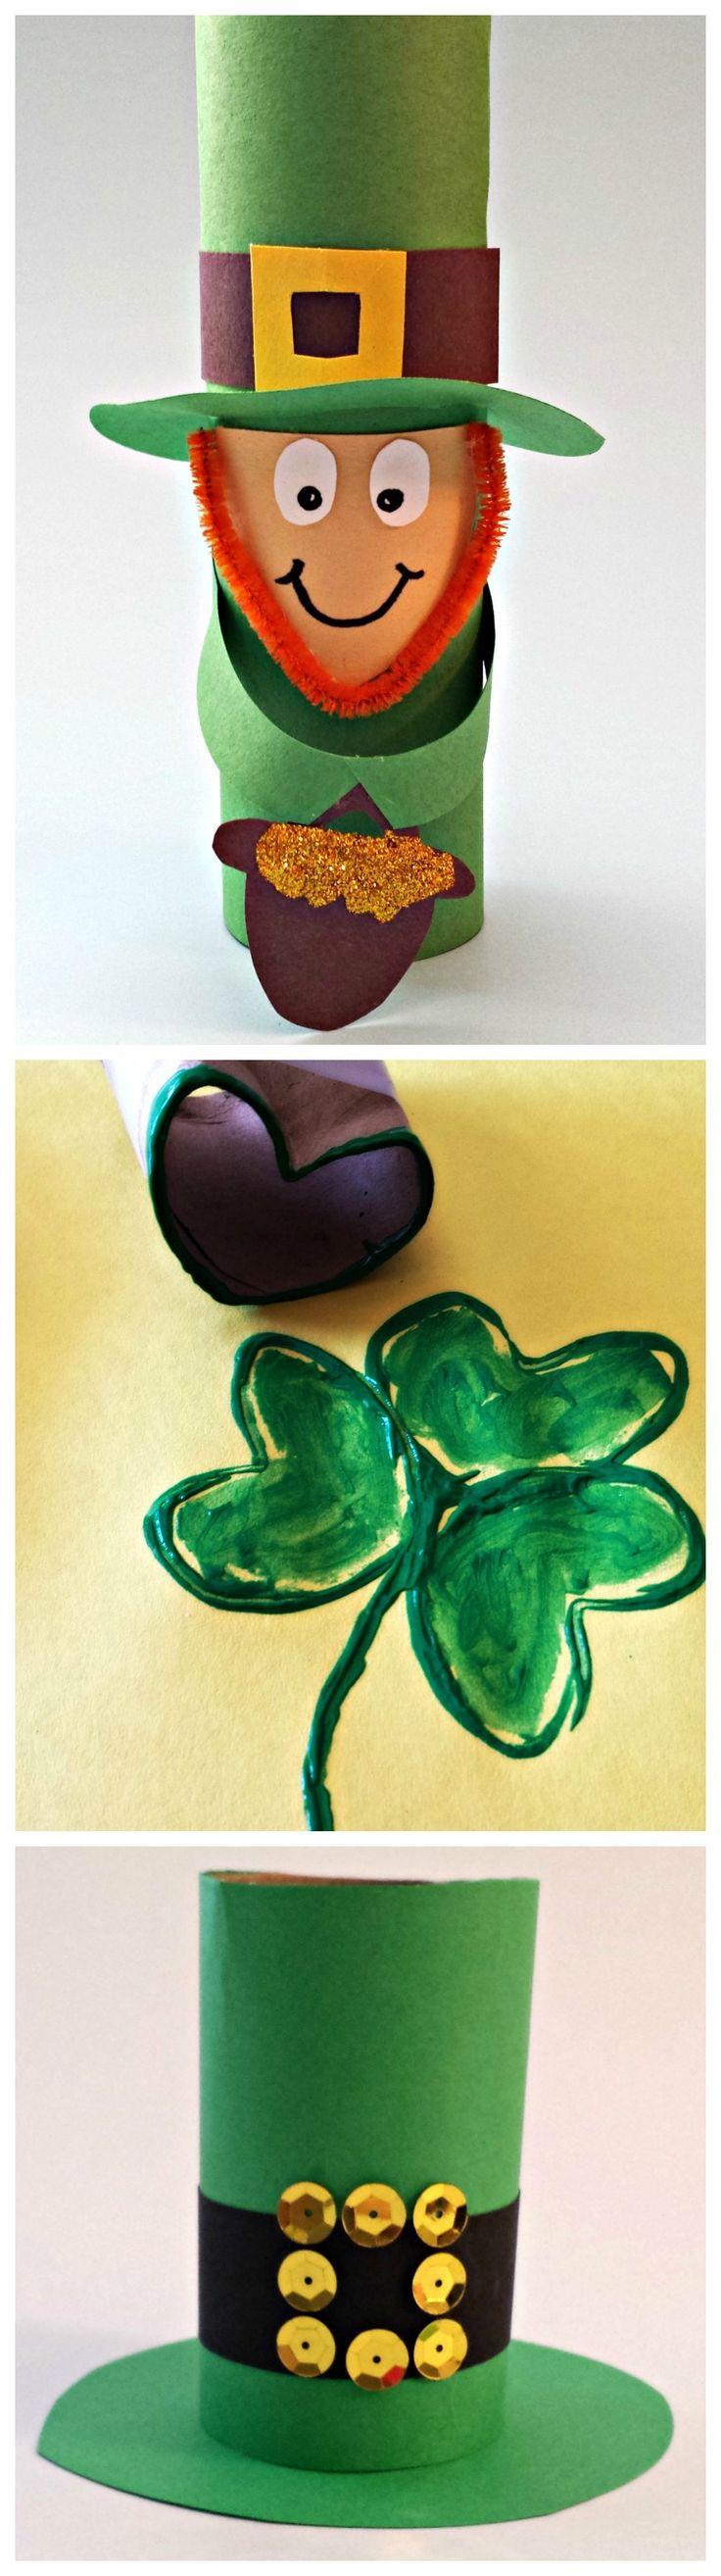 St. Patricks Day Toilet Paper Roll Crafts for Kids (Leprechaun, shamrock, hat) #DIY #St pattys art projects   | http://www.sassydealz.com/2014/02/easy-st-patricks-day-crafts-kids.html